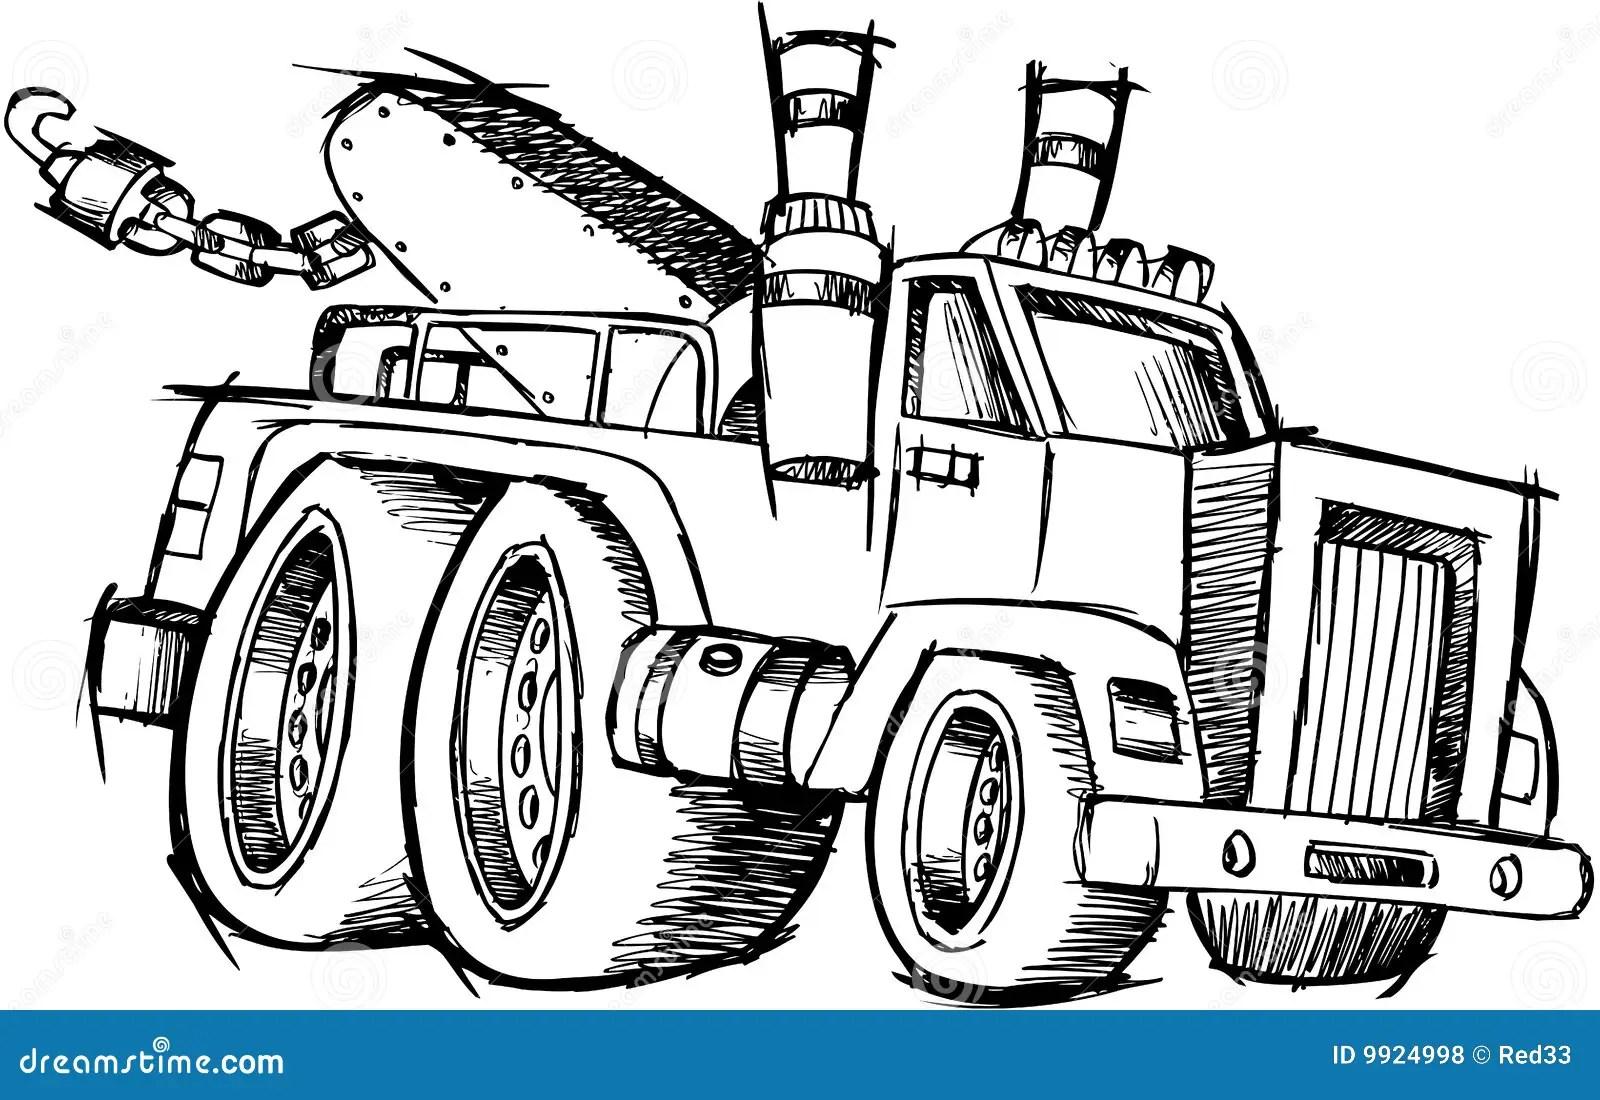 Vecteur Peu Precis De Camion De Remorquage Illustration De